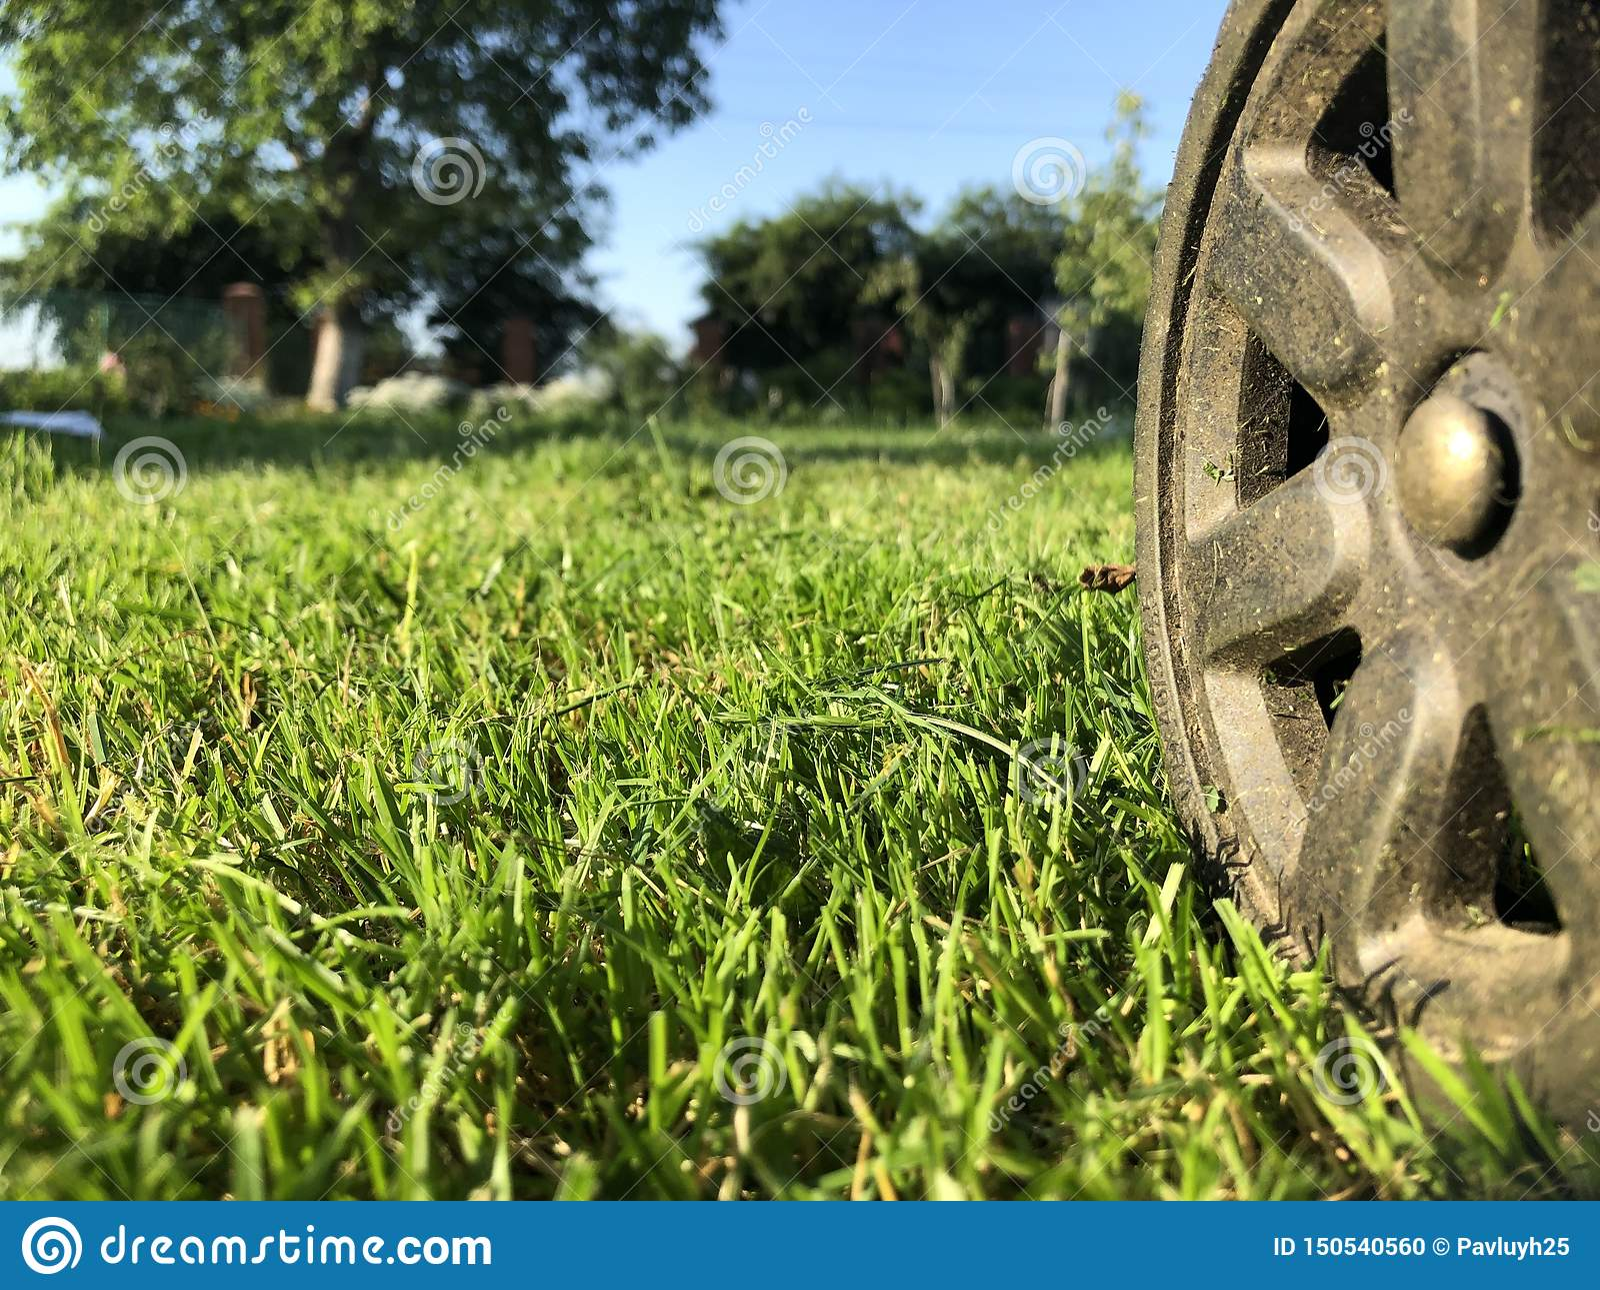 Колесо от газонокосилки на truncheted лужайке фермы